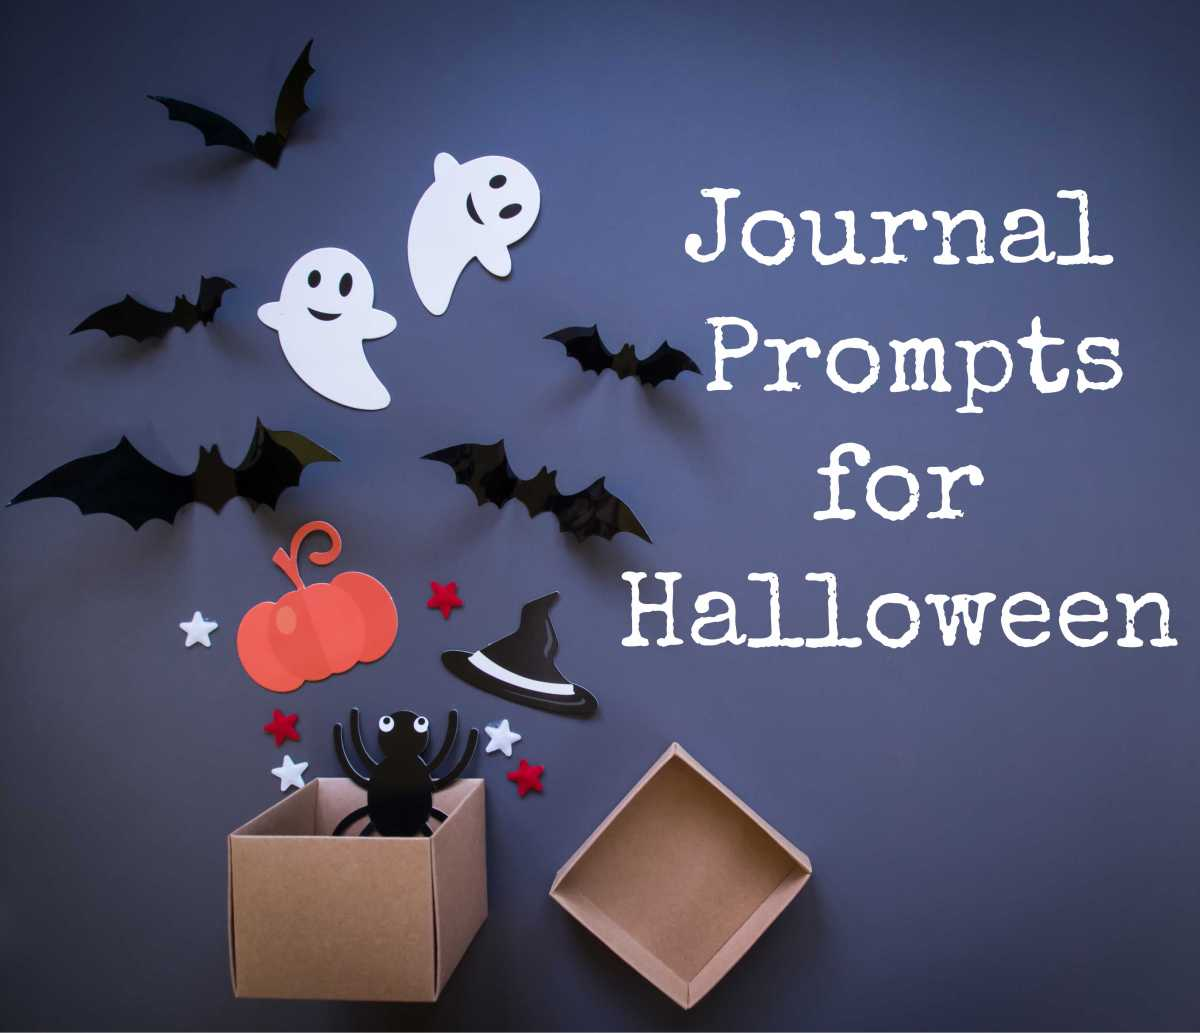 Journal Prompts forHalloween